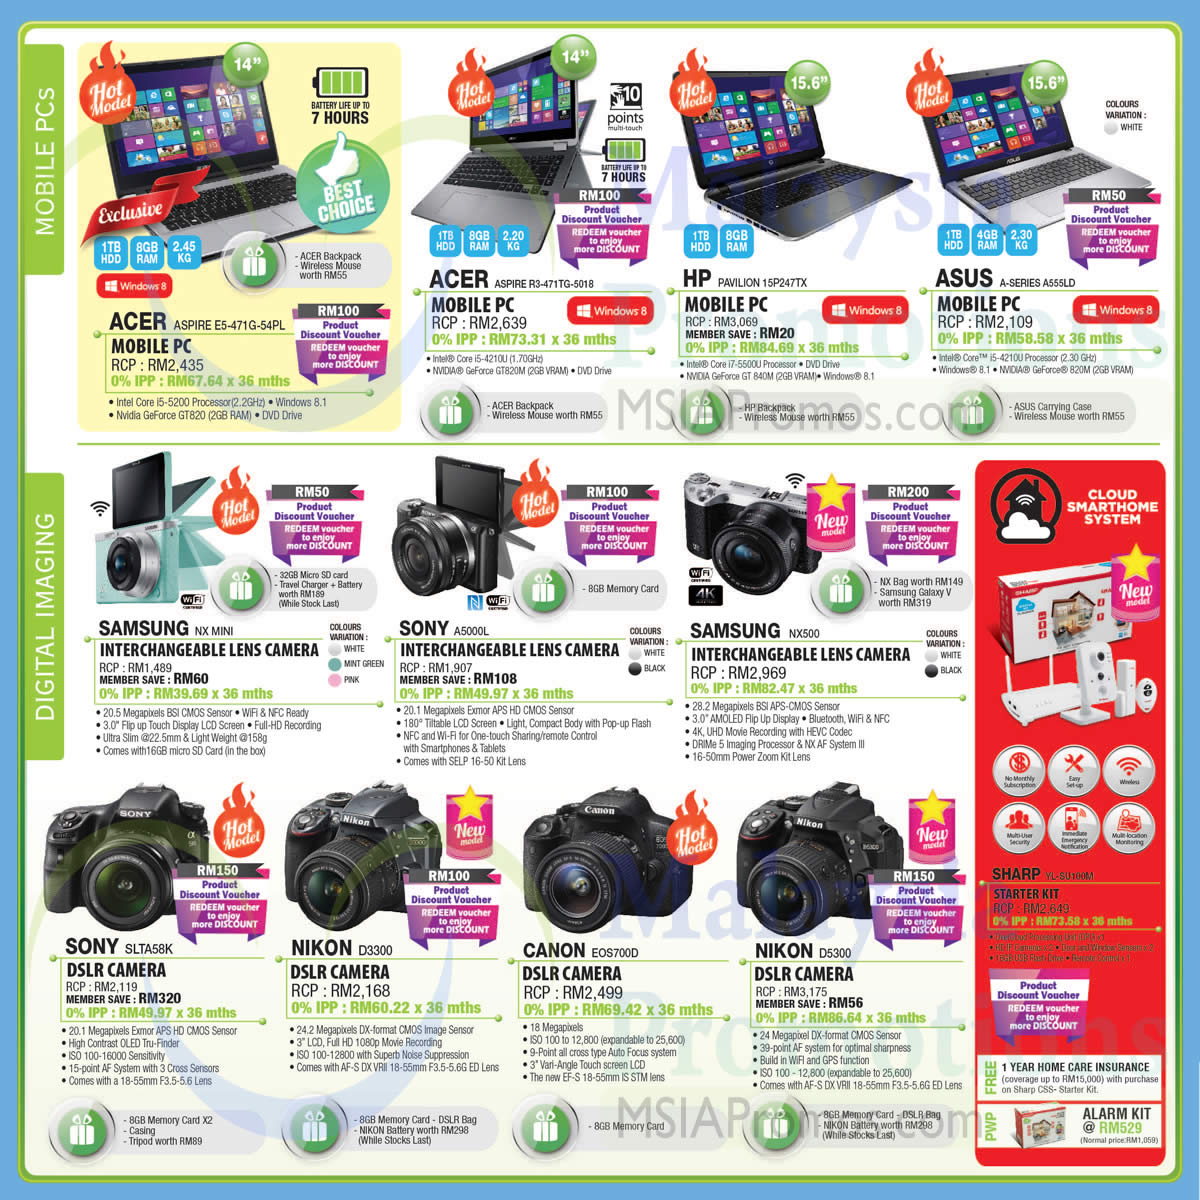 Notebook samsung format - Notebooks Digital Cameras Smarthome System Starter Kit Sharp Sony Samsung Acer Aspire Nikon Canon Hp Pavilion Asus